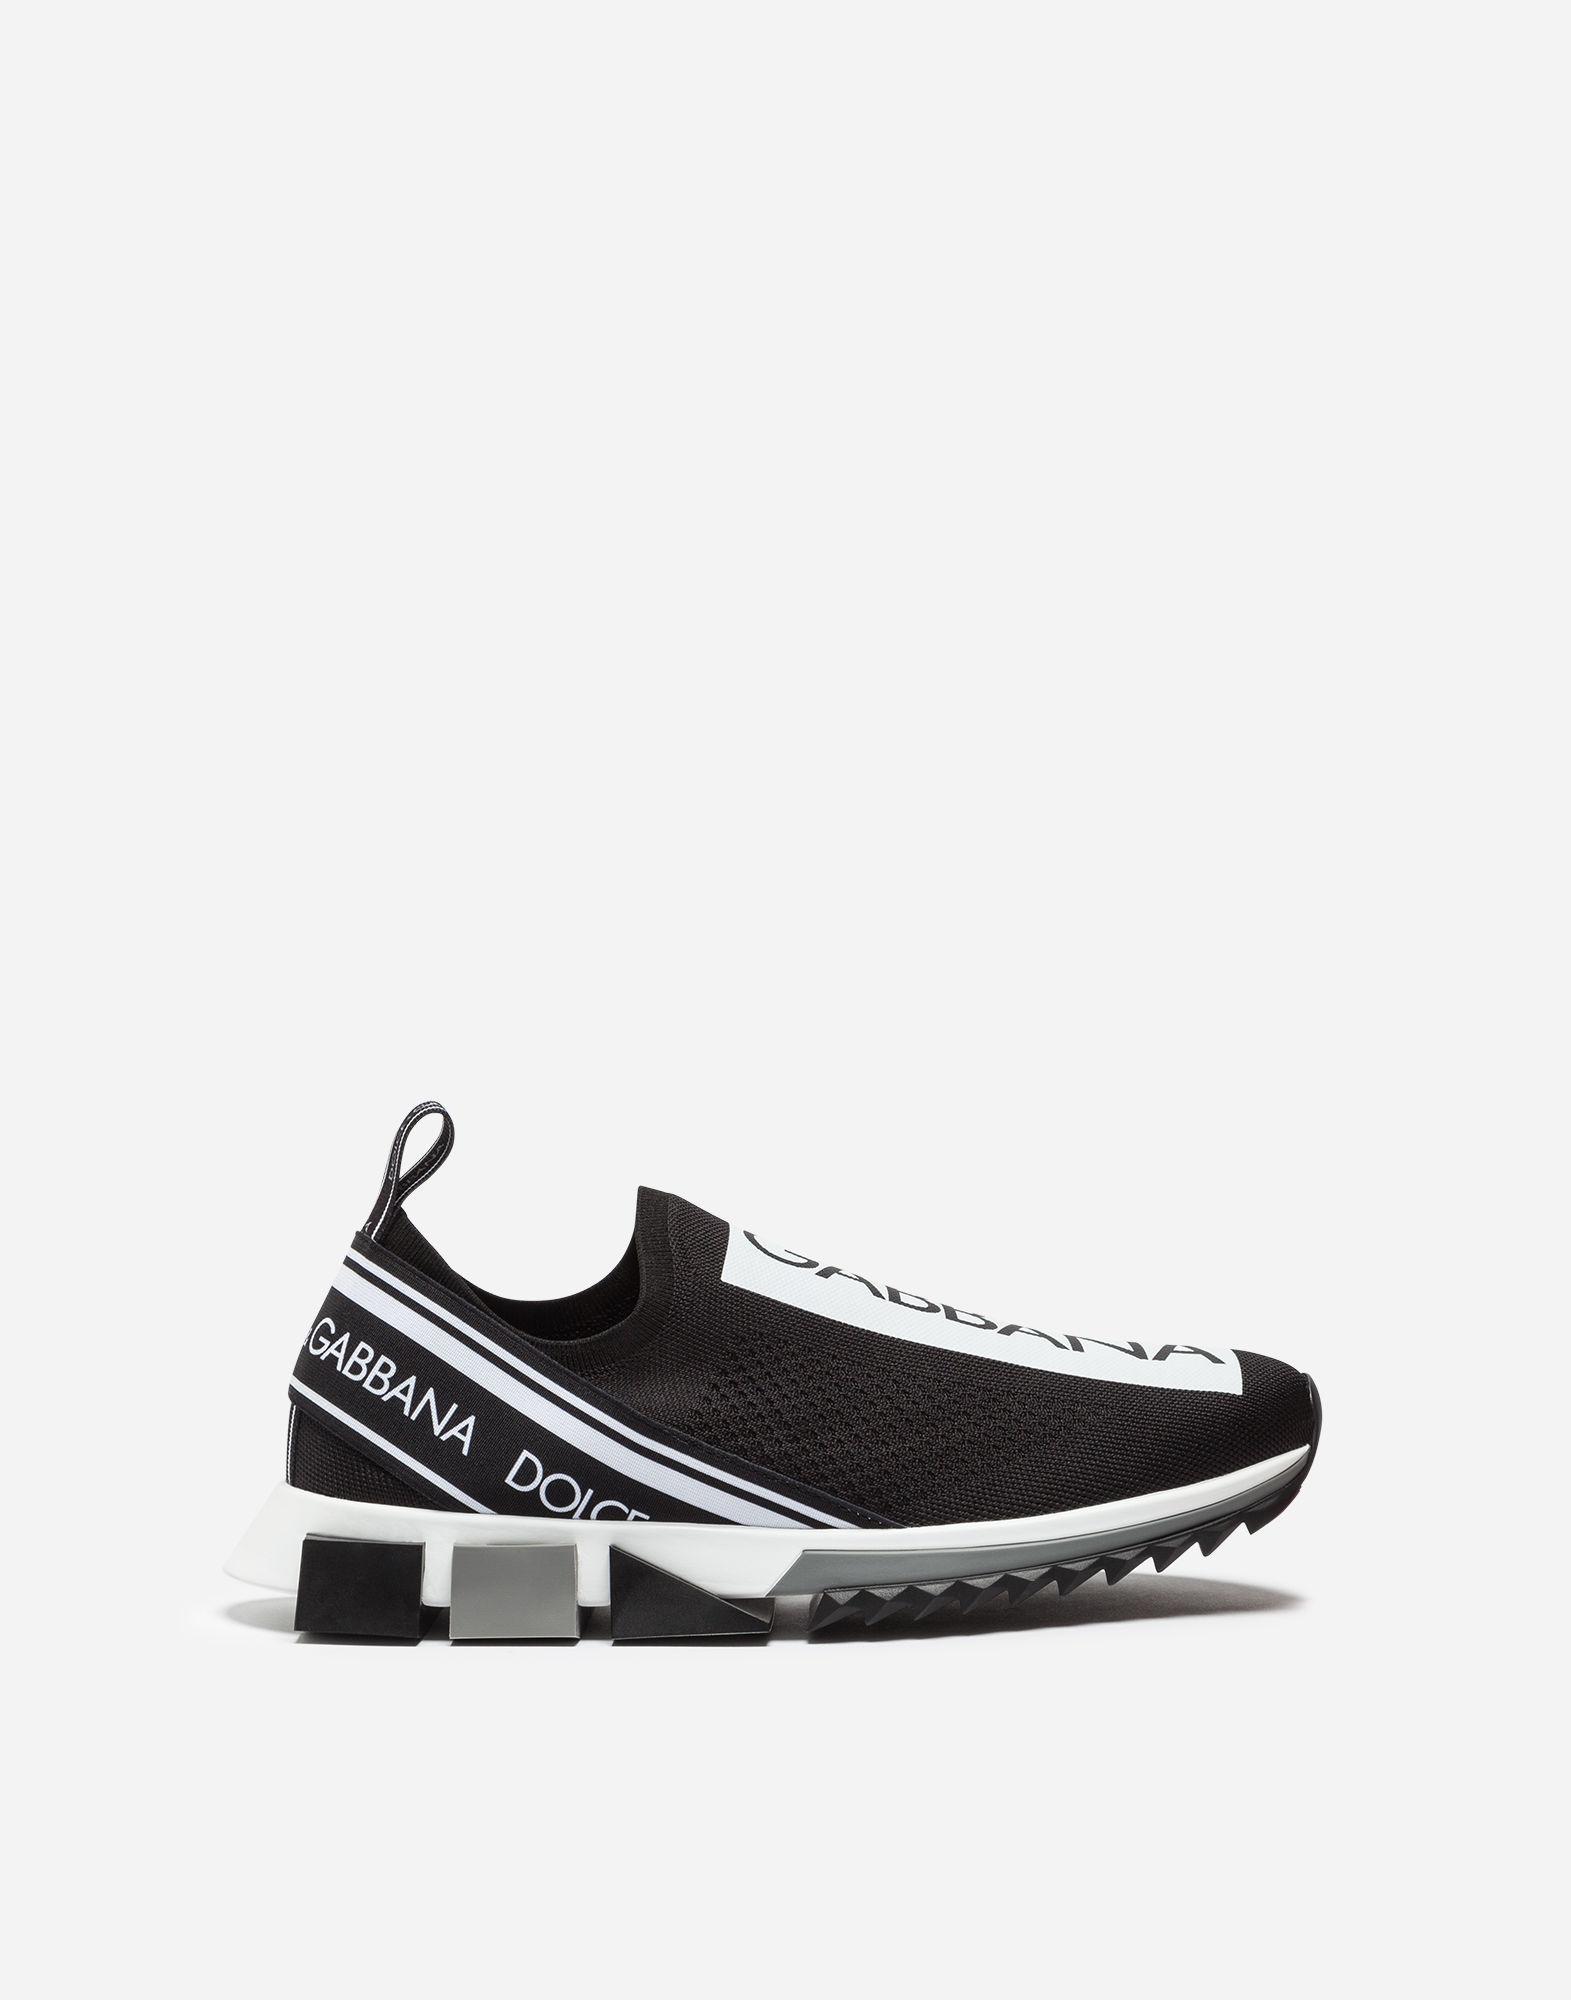 Dolce & Gabbana Sorrento logo sneakers sast clearance supply wRQQBia1